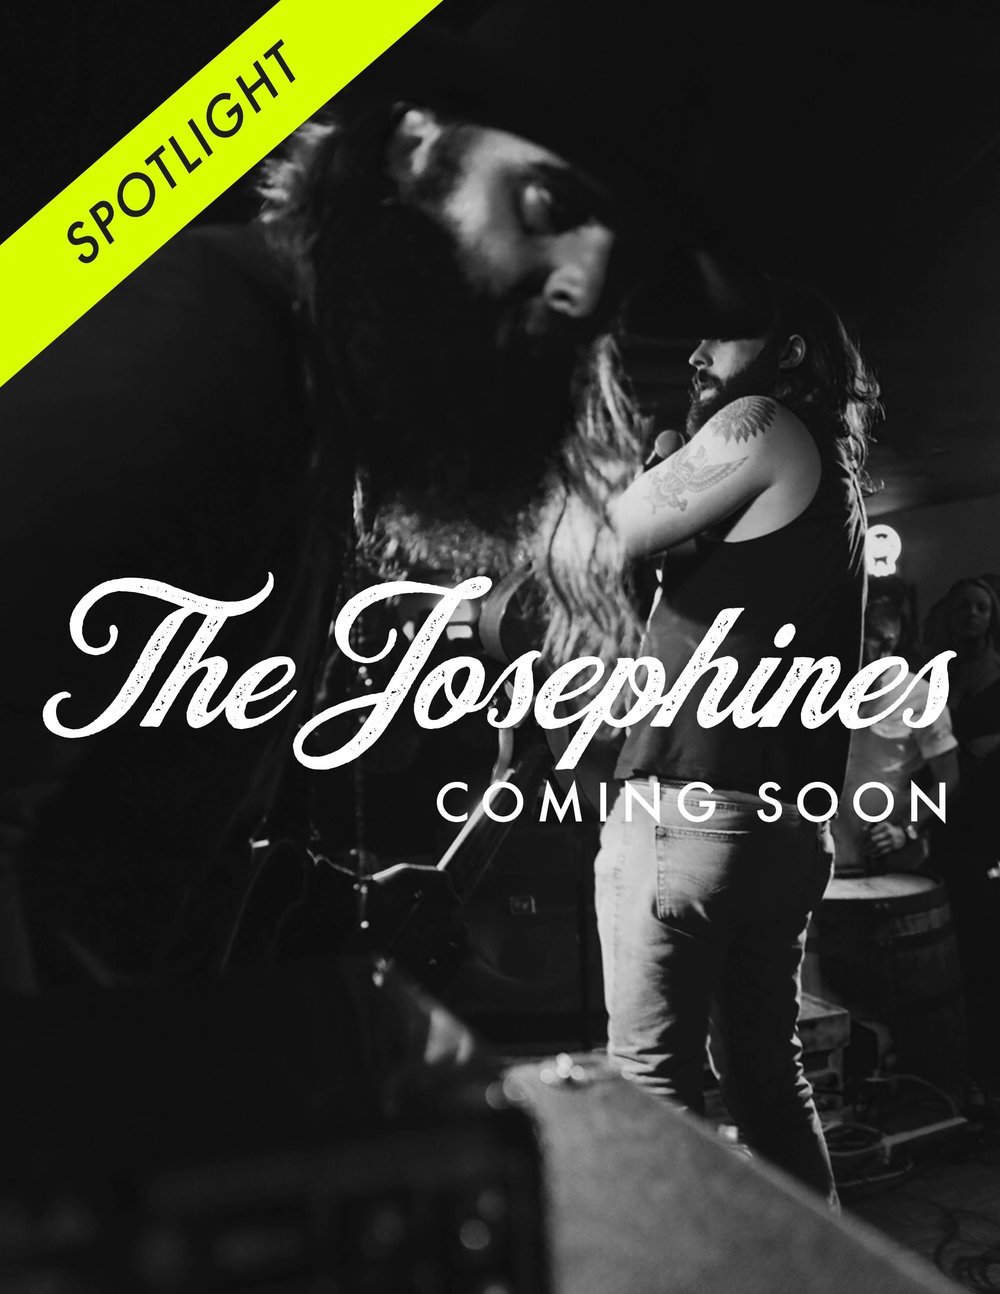 Thejosephines_spotlight_cover.jpg